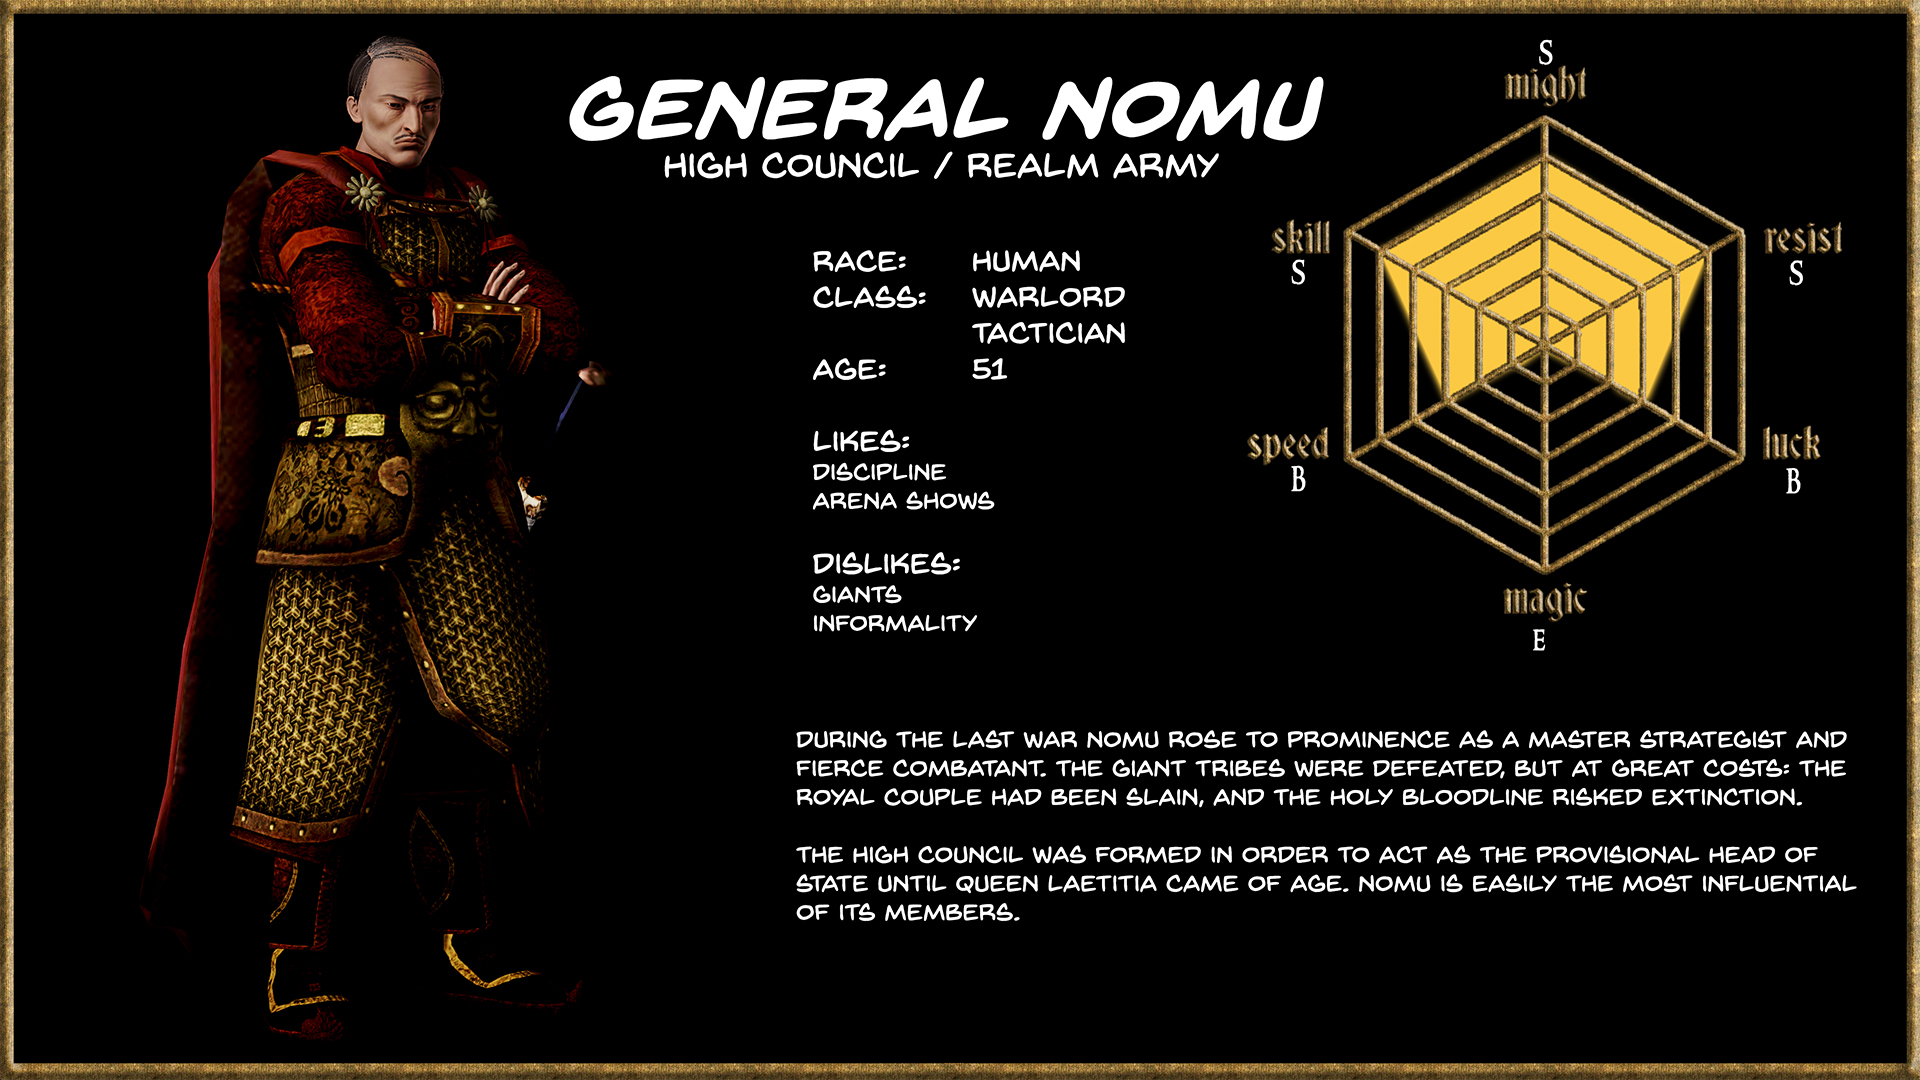 General Nomu